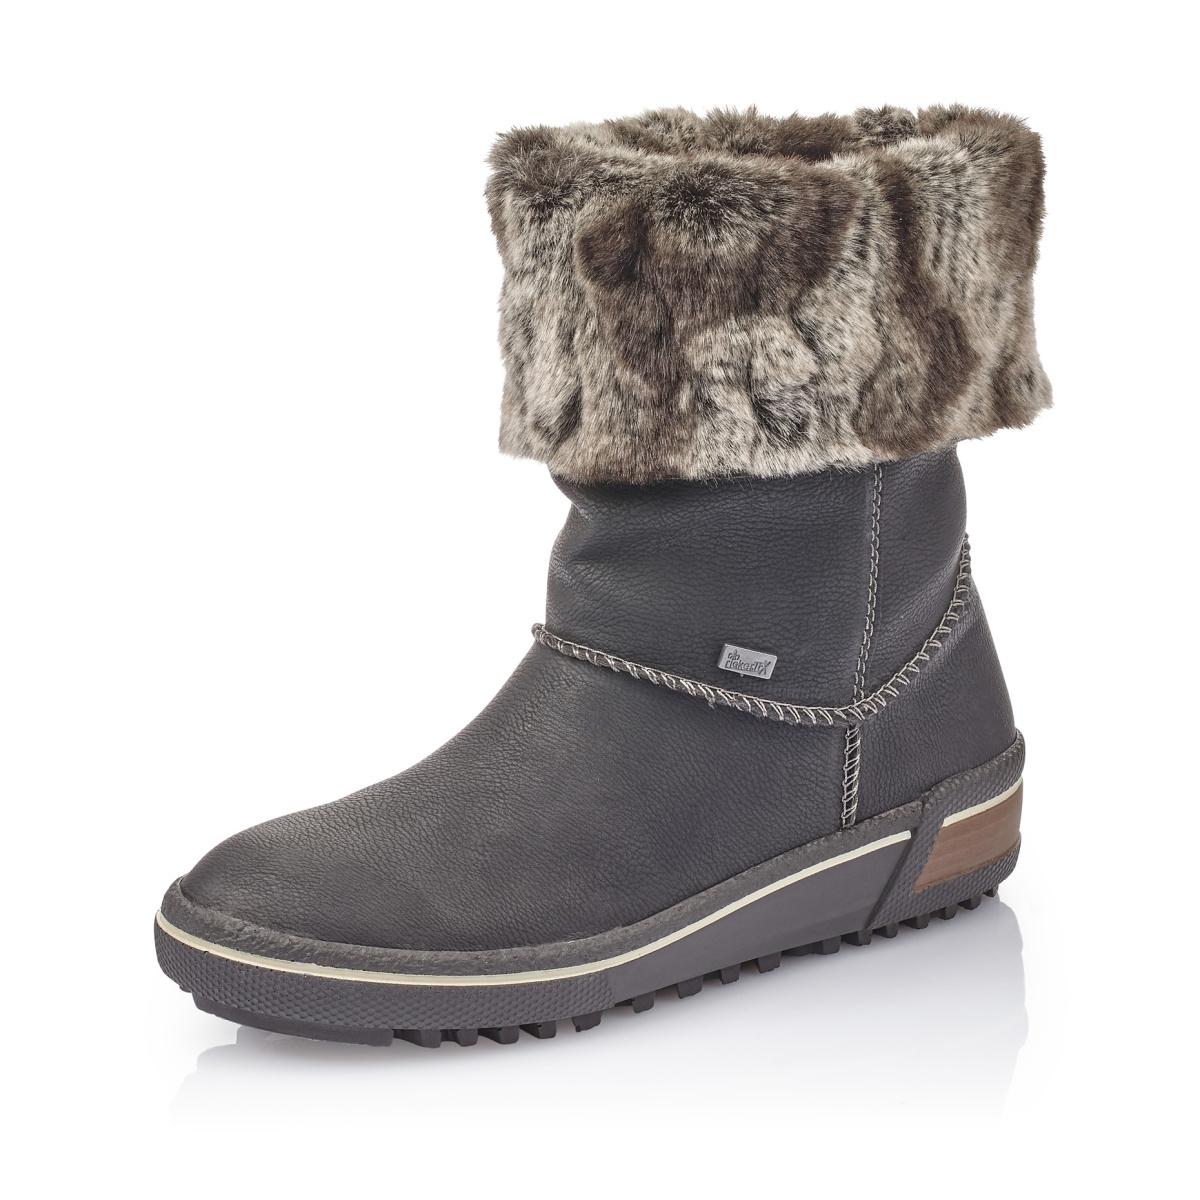 116125621d1f0 Dámska obuv RIEKER Z6492/00 SCHWARZ KOMBI H/W 8 | Rieker